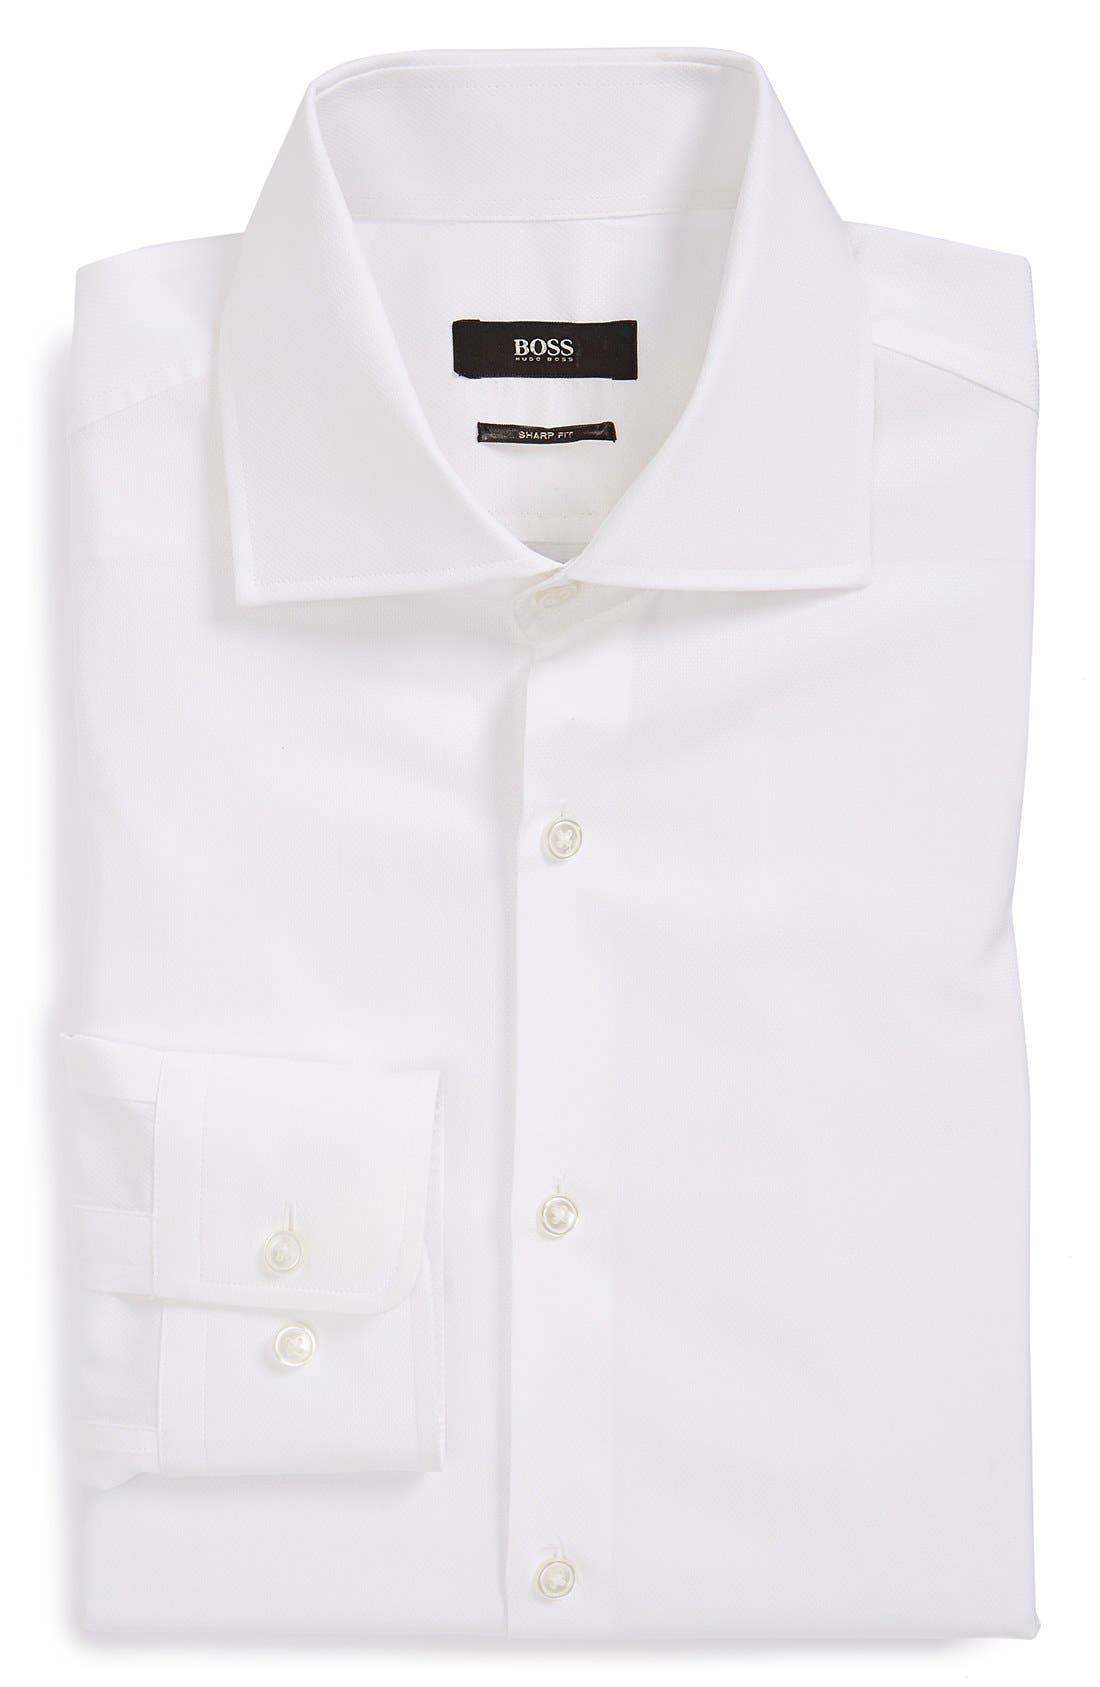 Main Image - BOSS 'Miles' Sharp Fit Piqué Dress Shirt